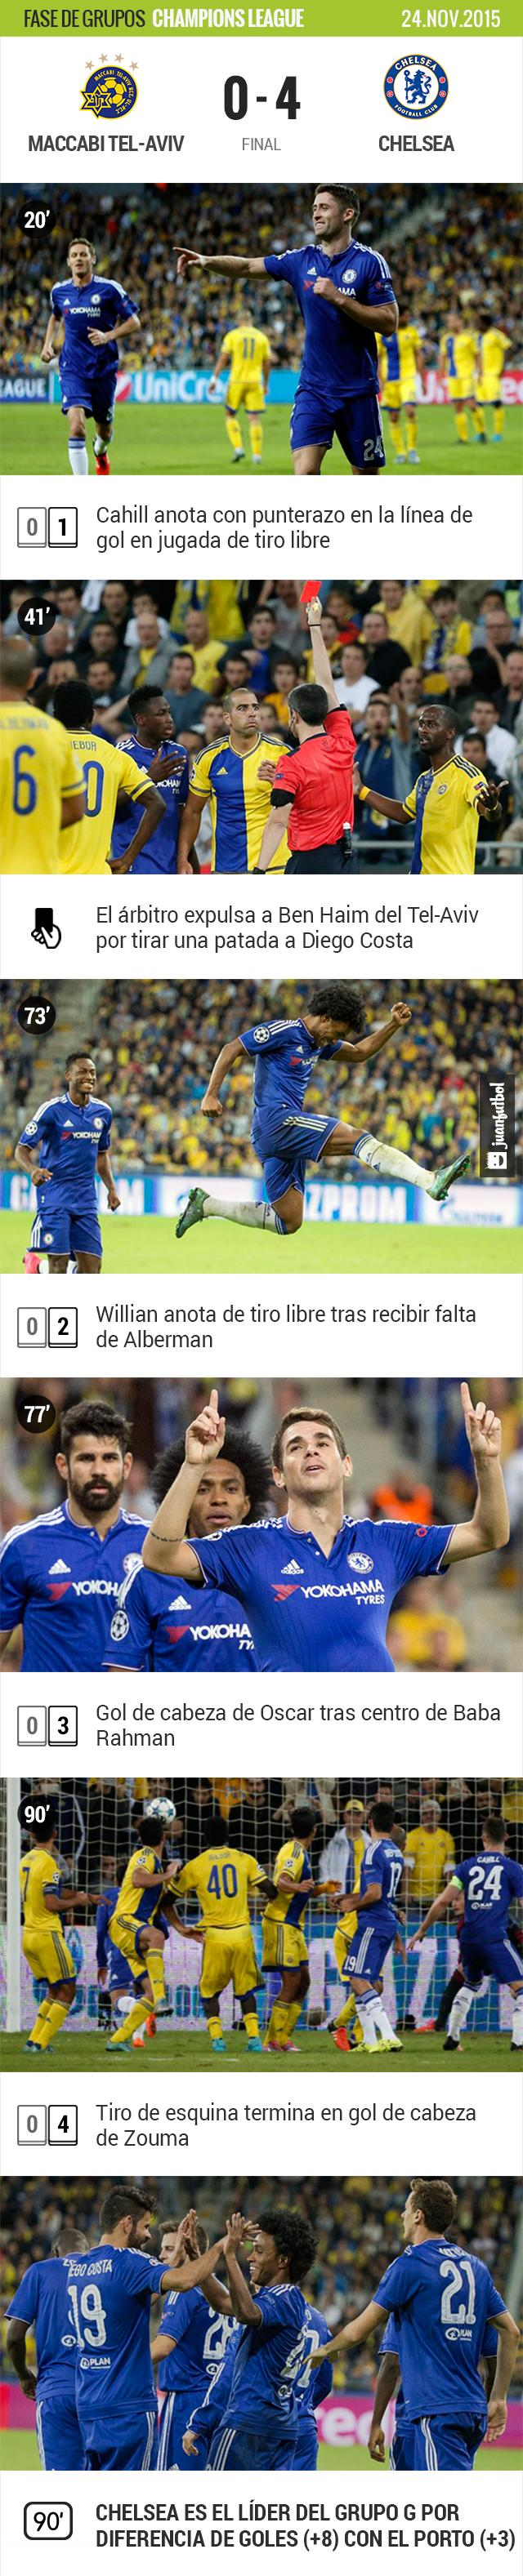 Chelsea gana por goleada ante el Maccabi Tel-Aviv